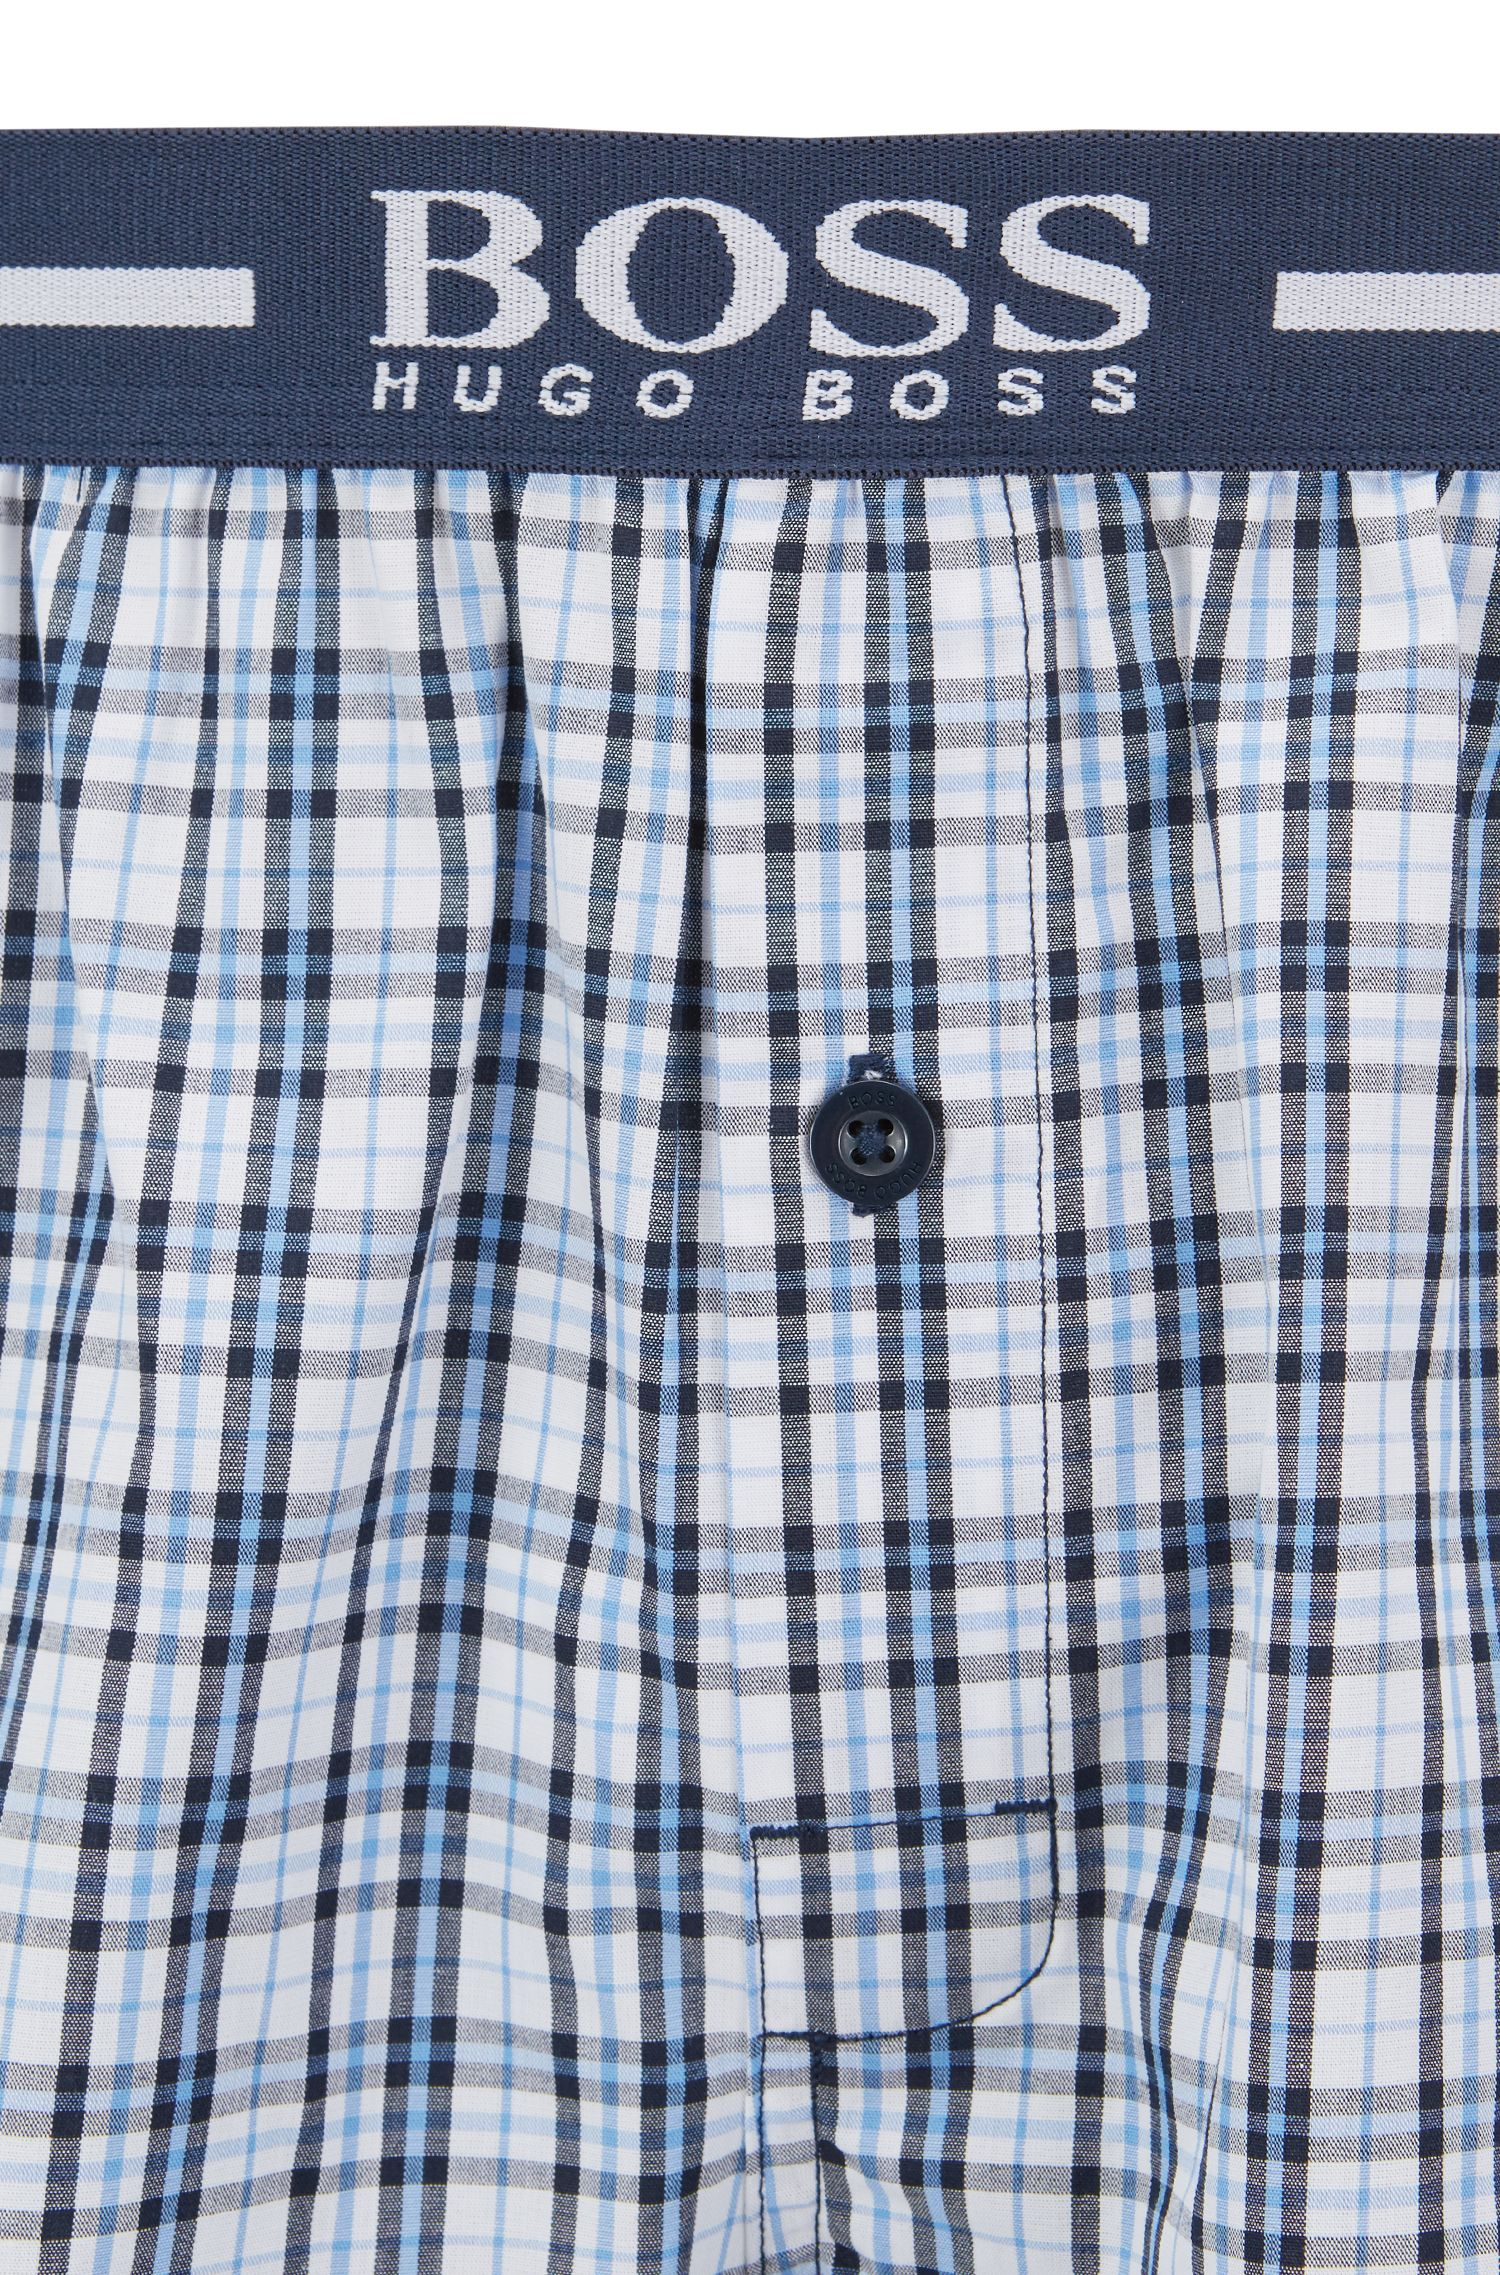 Hugo Boss - Lot de deux shorts de pyjama en popeline de coton tissée - 2